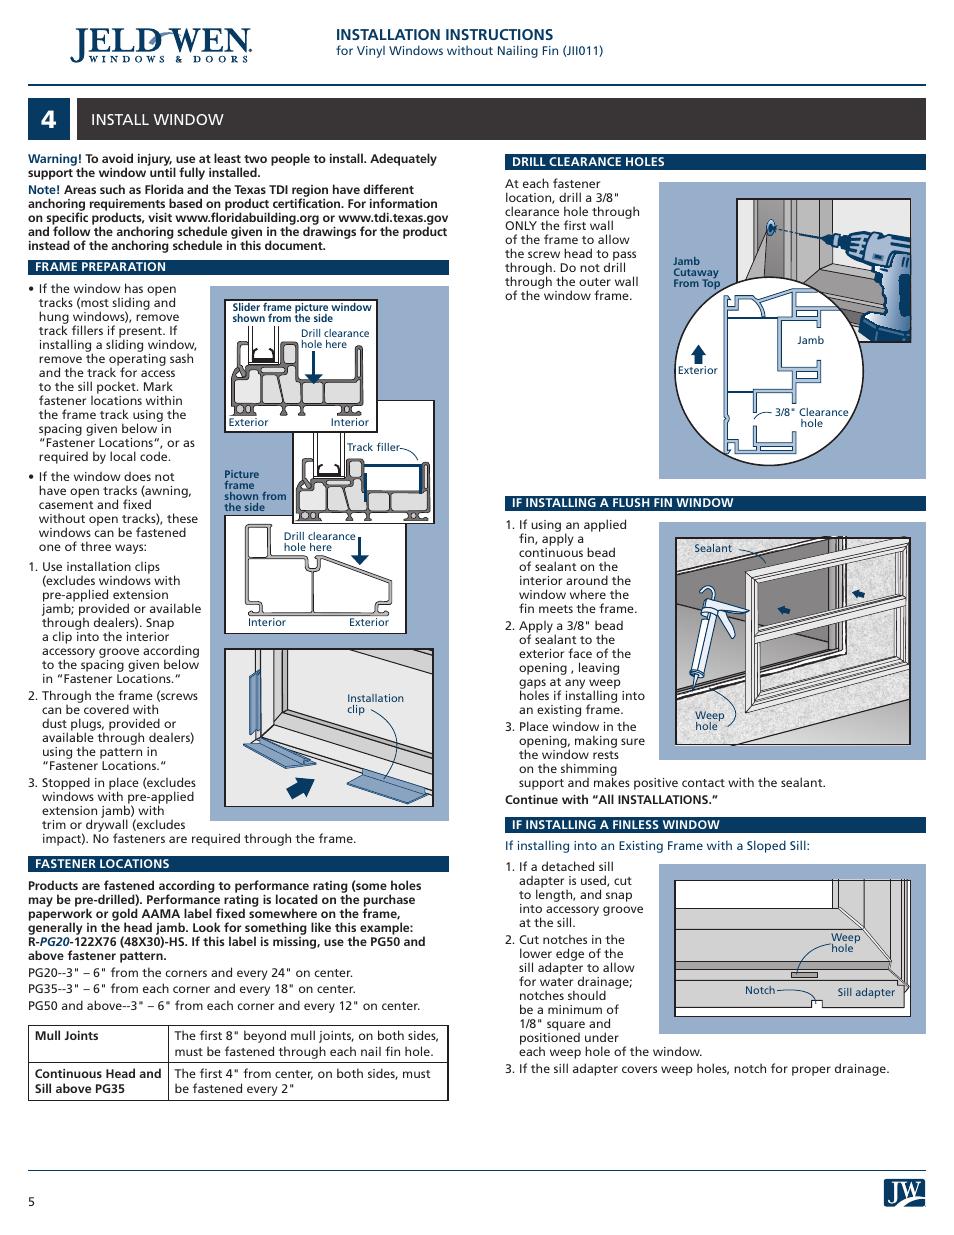 Jeld Wen Jii011 Vinyl Windows Without Nailing Fin User Manual Page 5 7